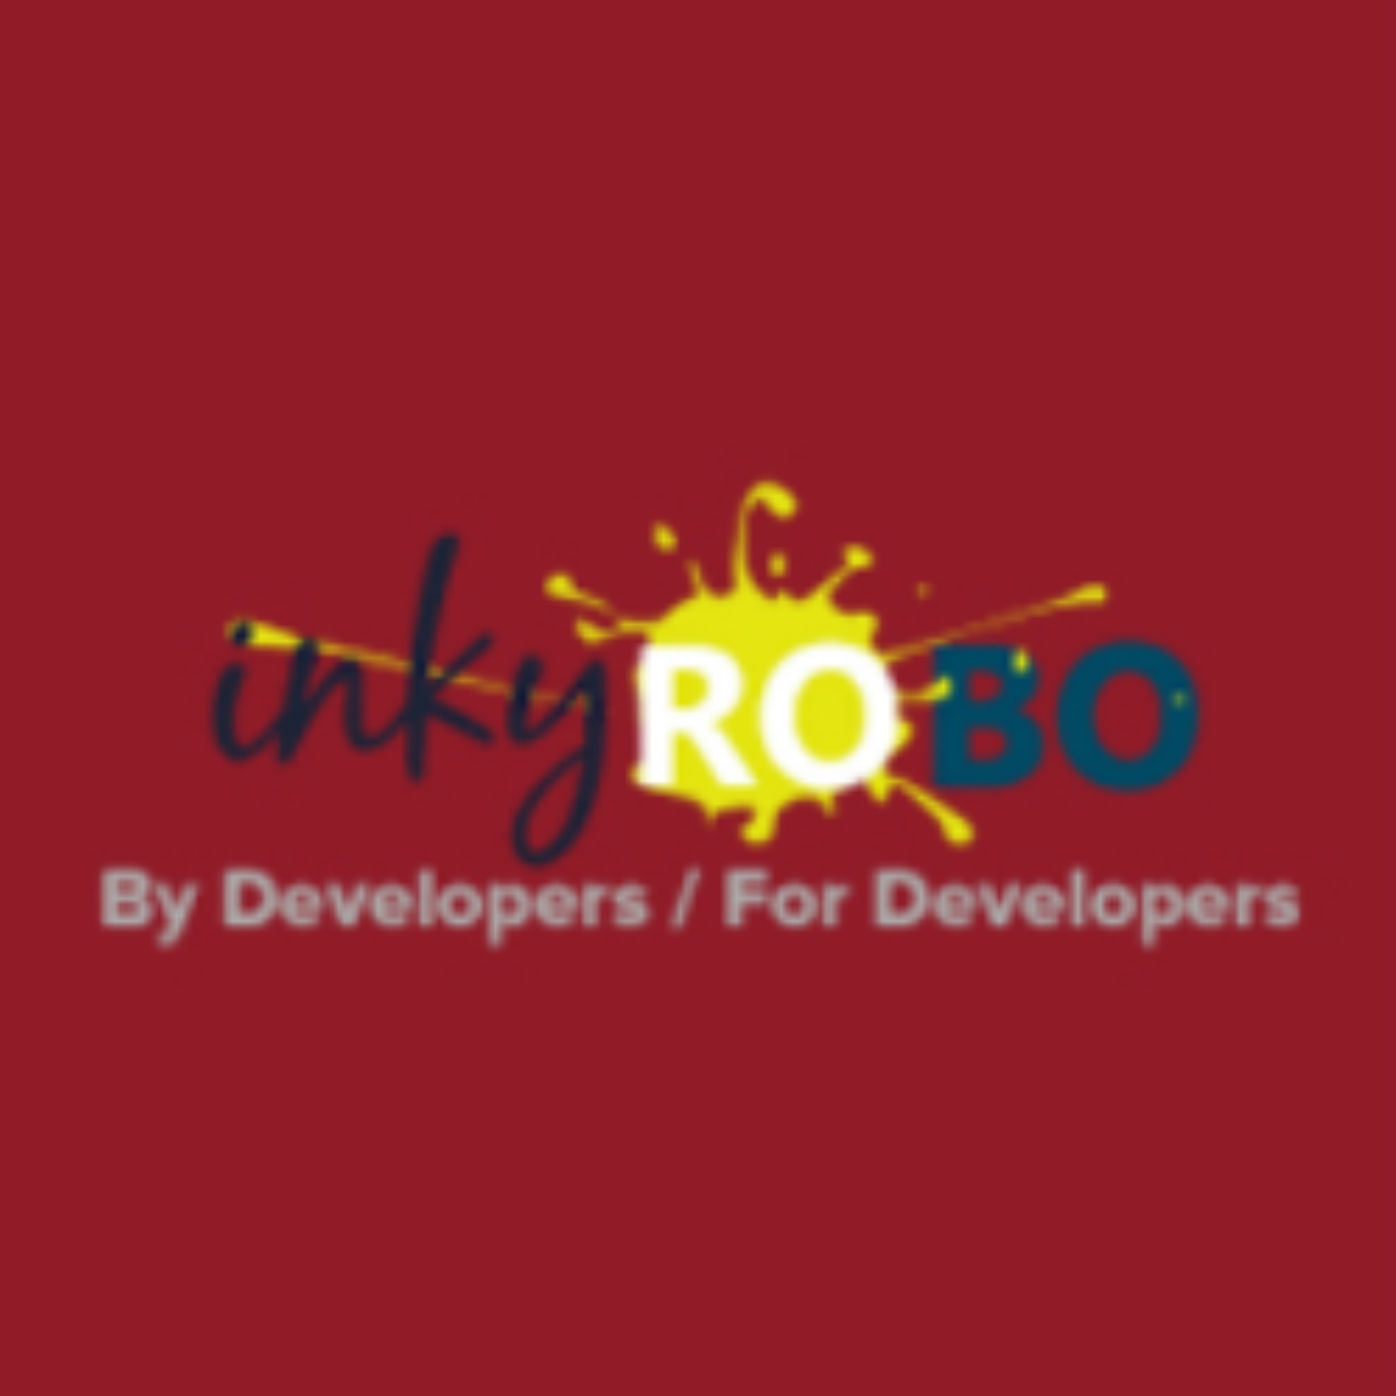 Inkyrobo 1488372421 logo